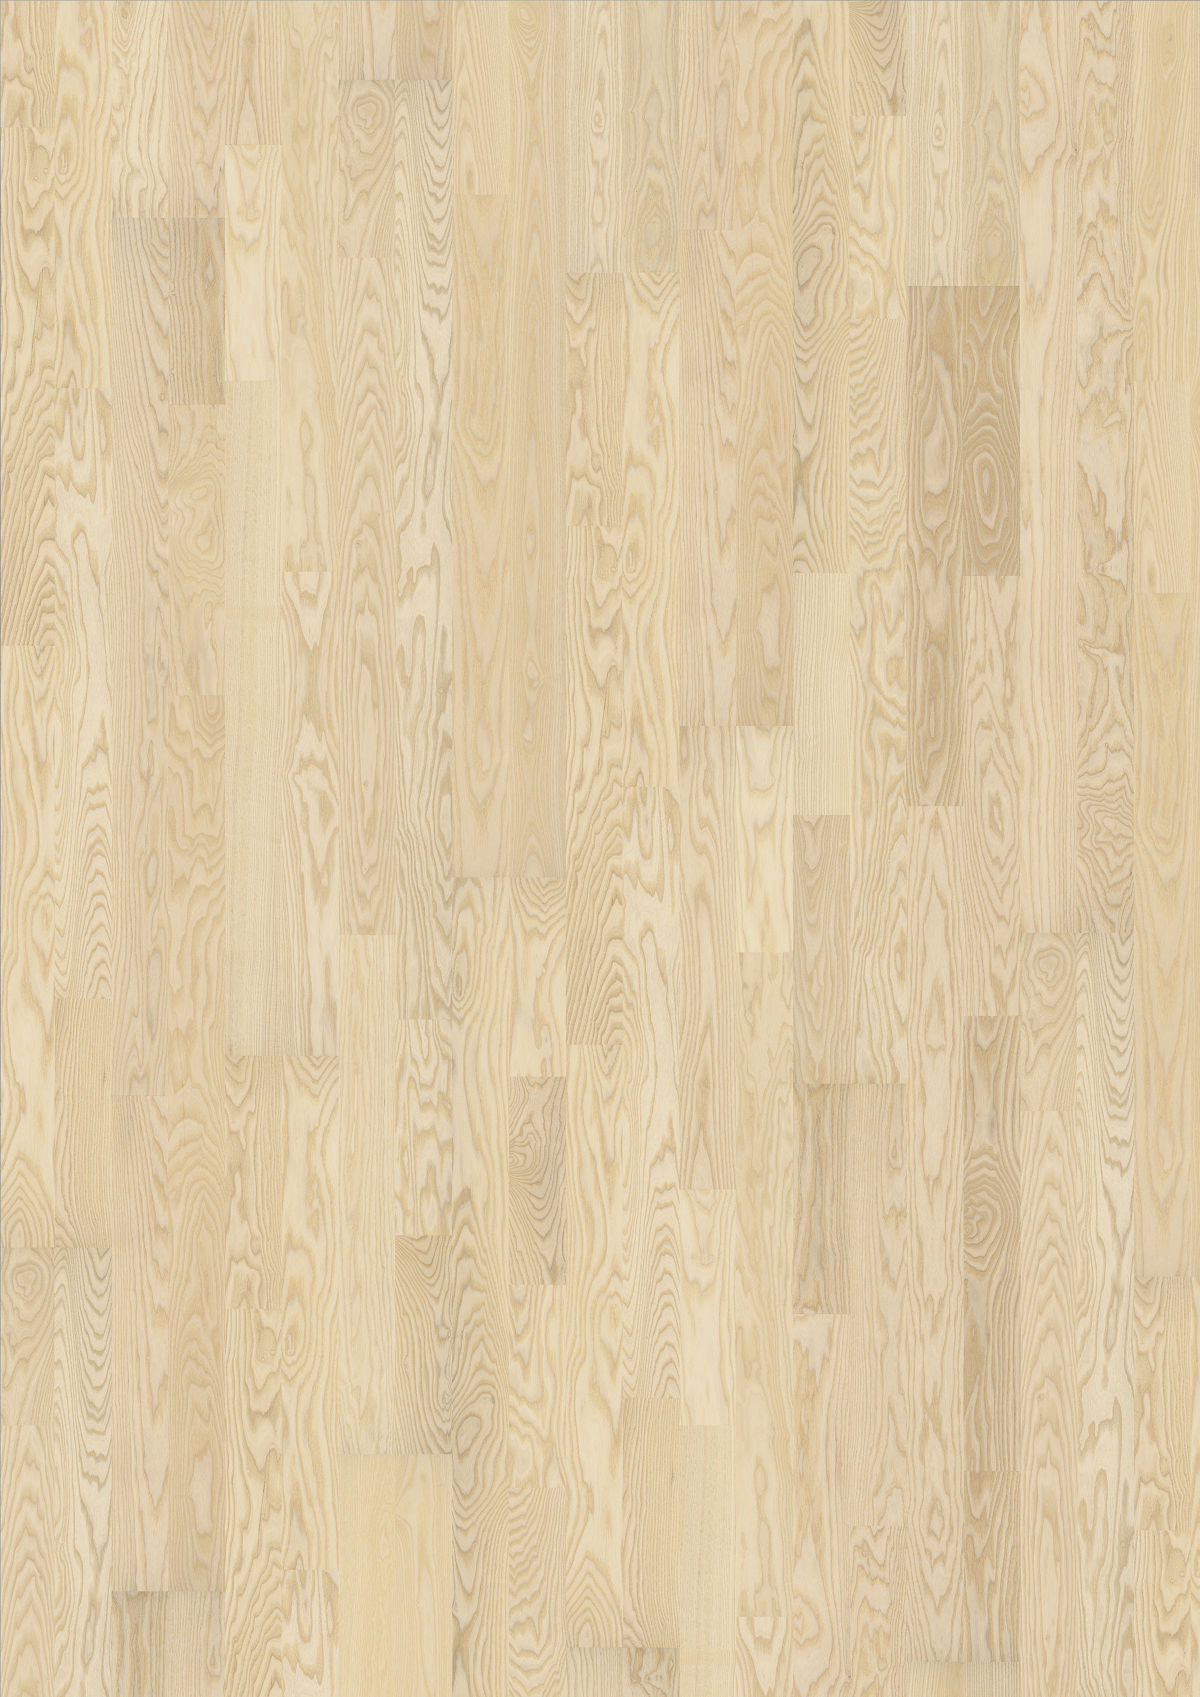 Kahrs Ash Falsterbo Engineered Wood Flooring